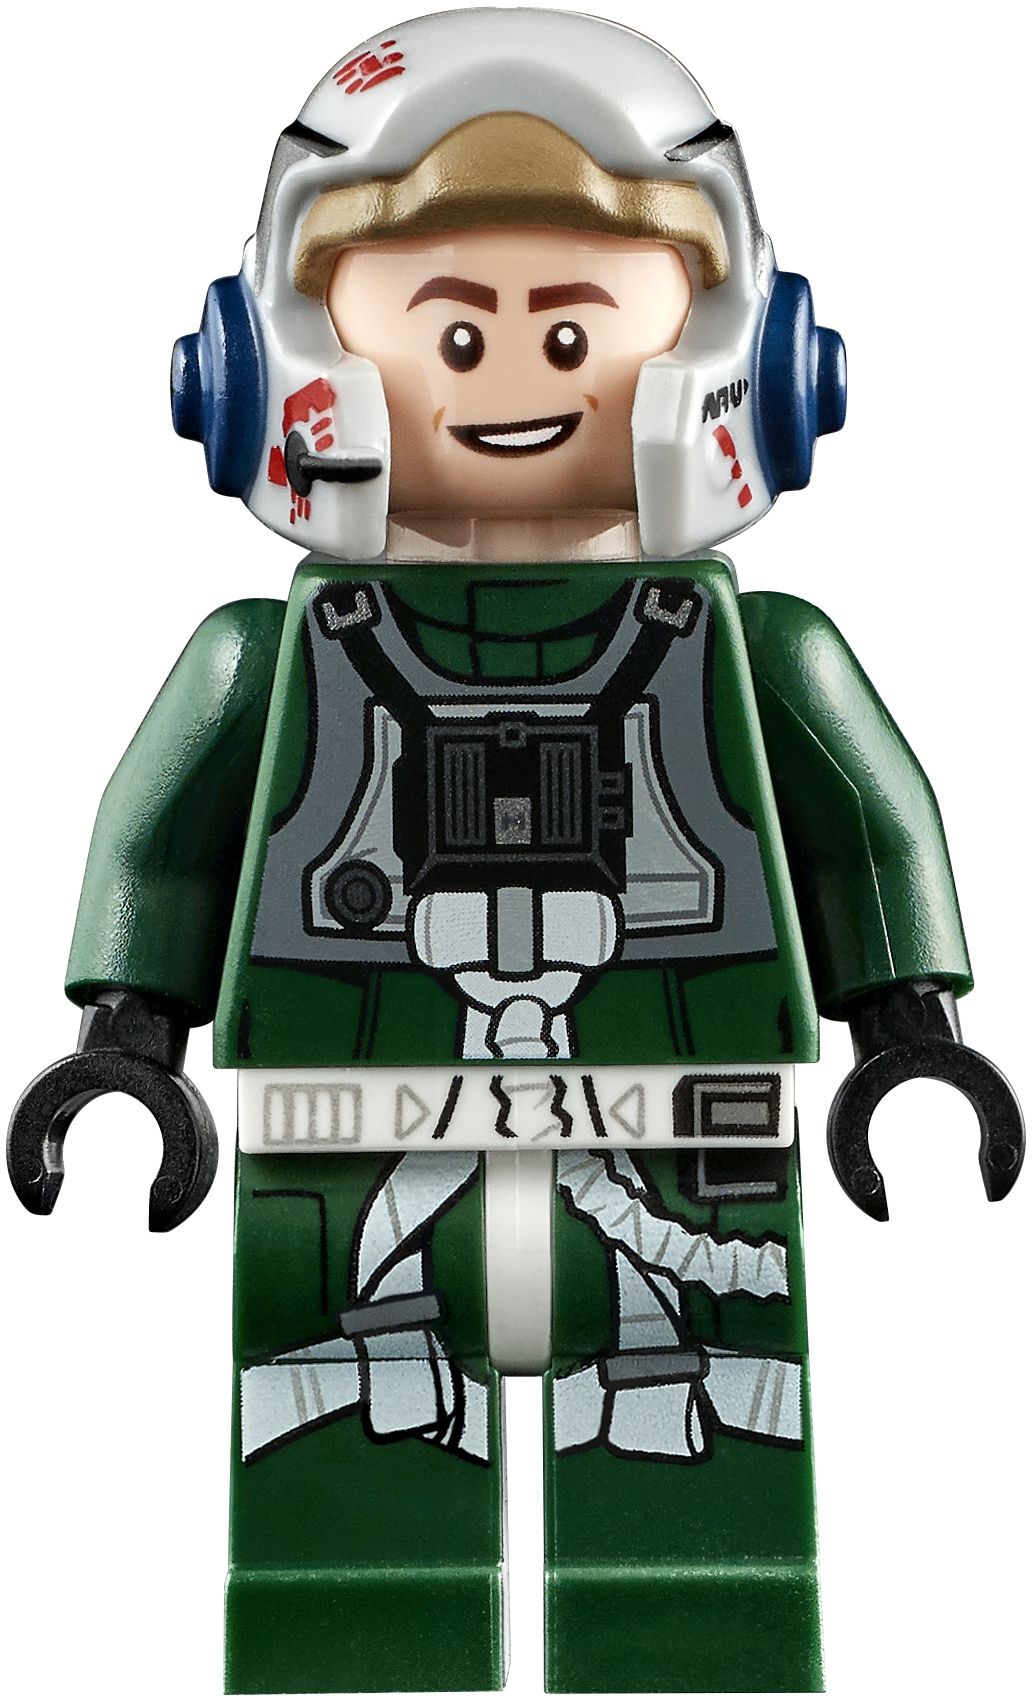 REBEL A-WING PILOT LIGHT FLESH HEAD FIGURE NEW 7754-2009 LEGO STAR WARS